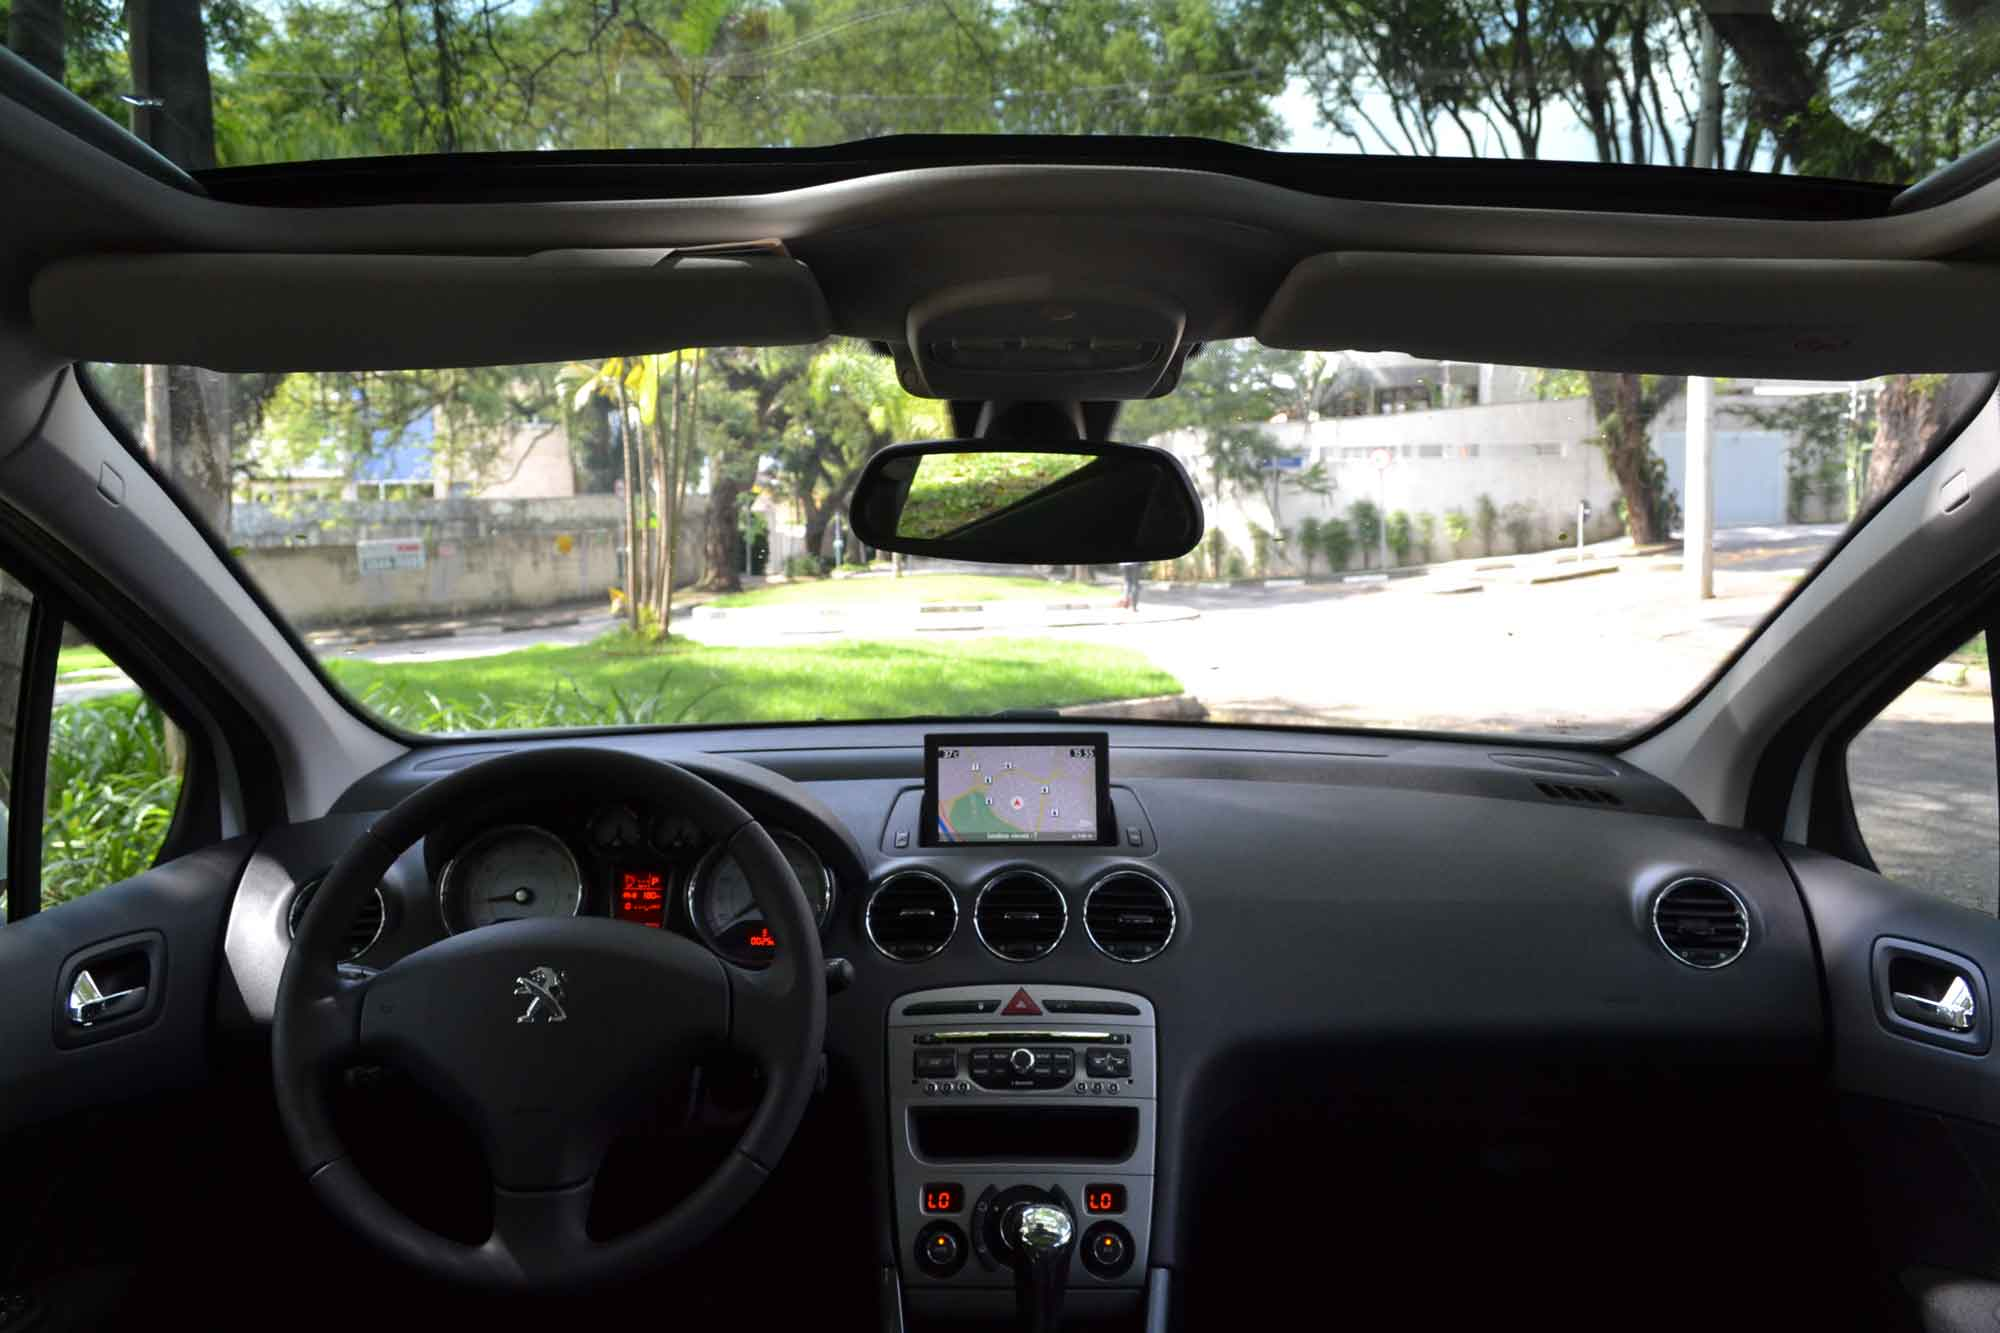 Peugeot 308 Agora Confi 225 Vel Sem Ser Gast 227 O